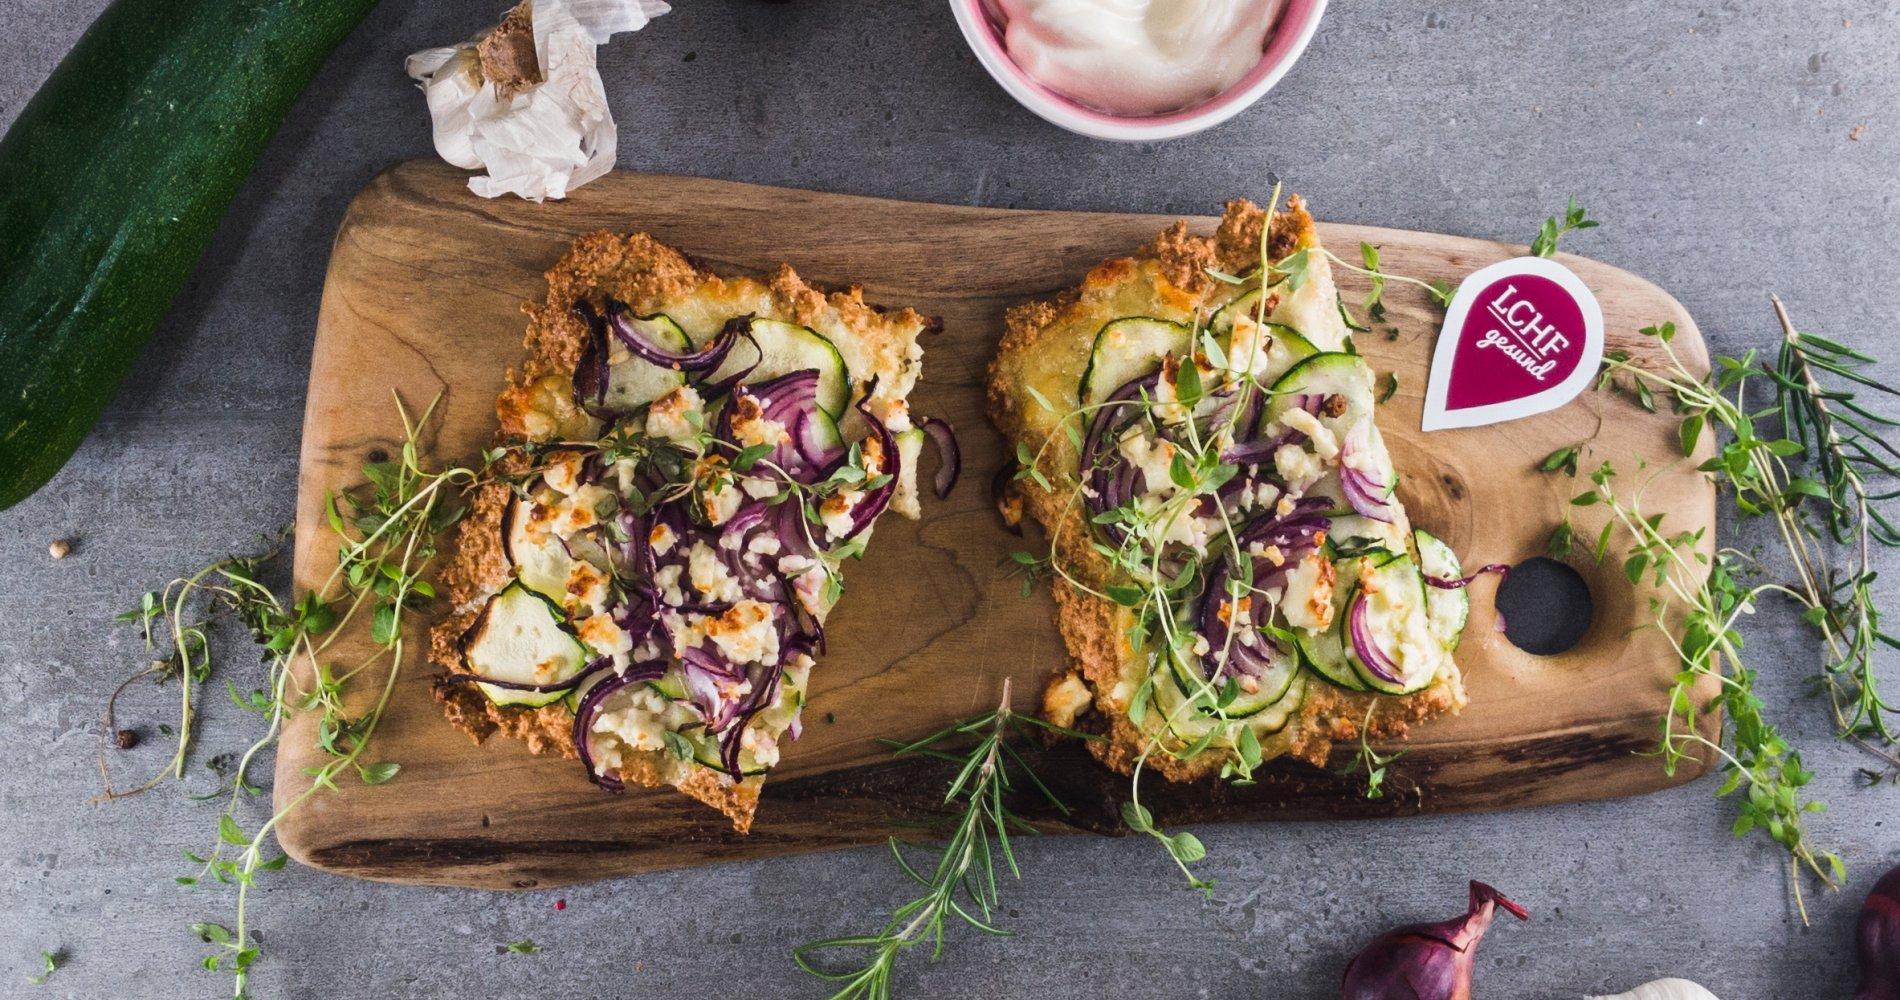 Rezept Low Carb: Zucchini-Zwiebel-Blechkuchen - LCHF-gesund.de